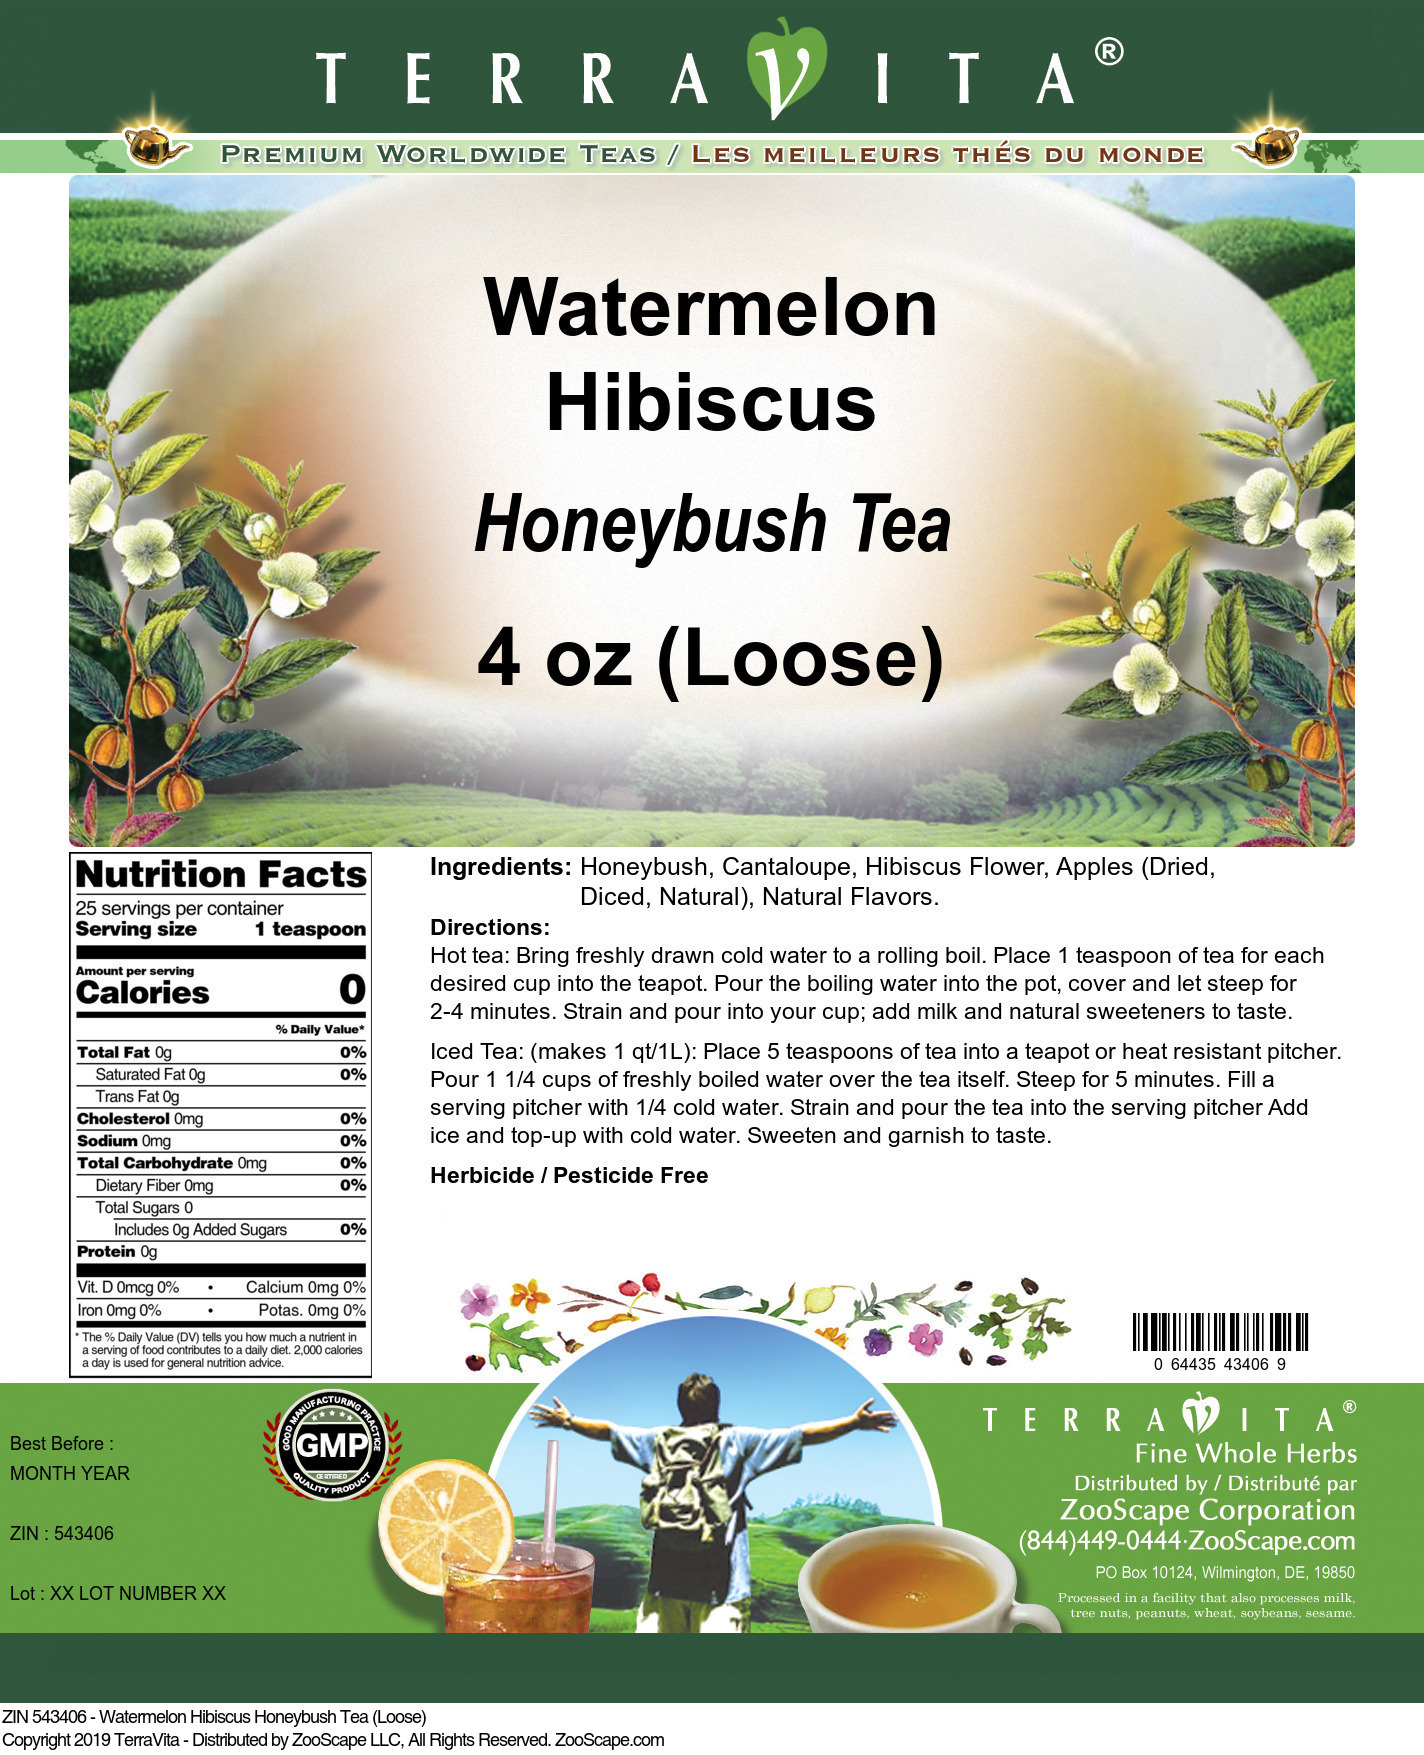 Watermelon Hibiscus Honeybush Tea (Loose)